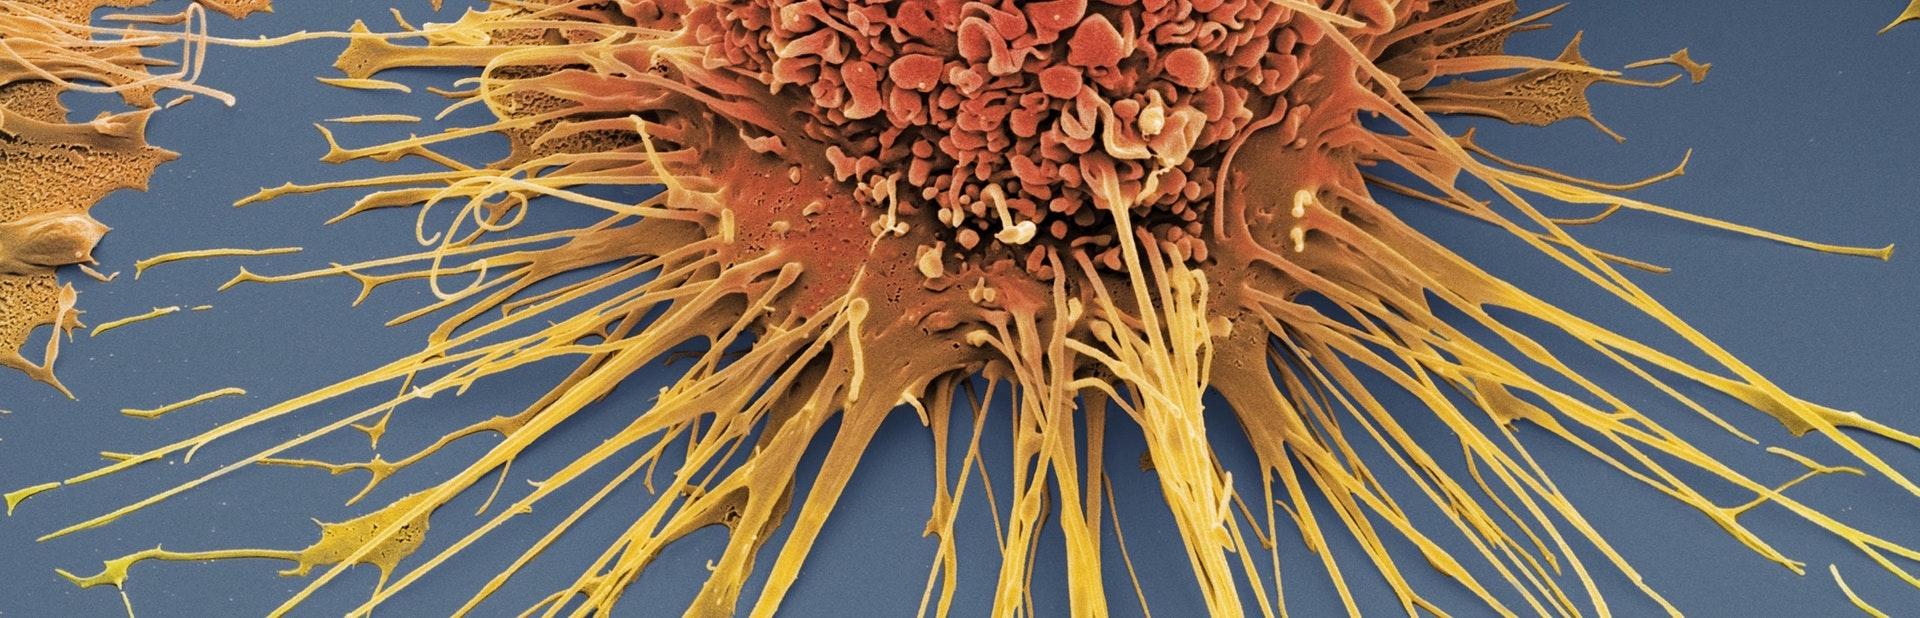 060516_macrophage_1